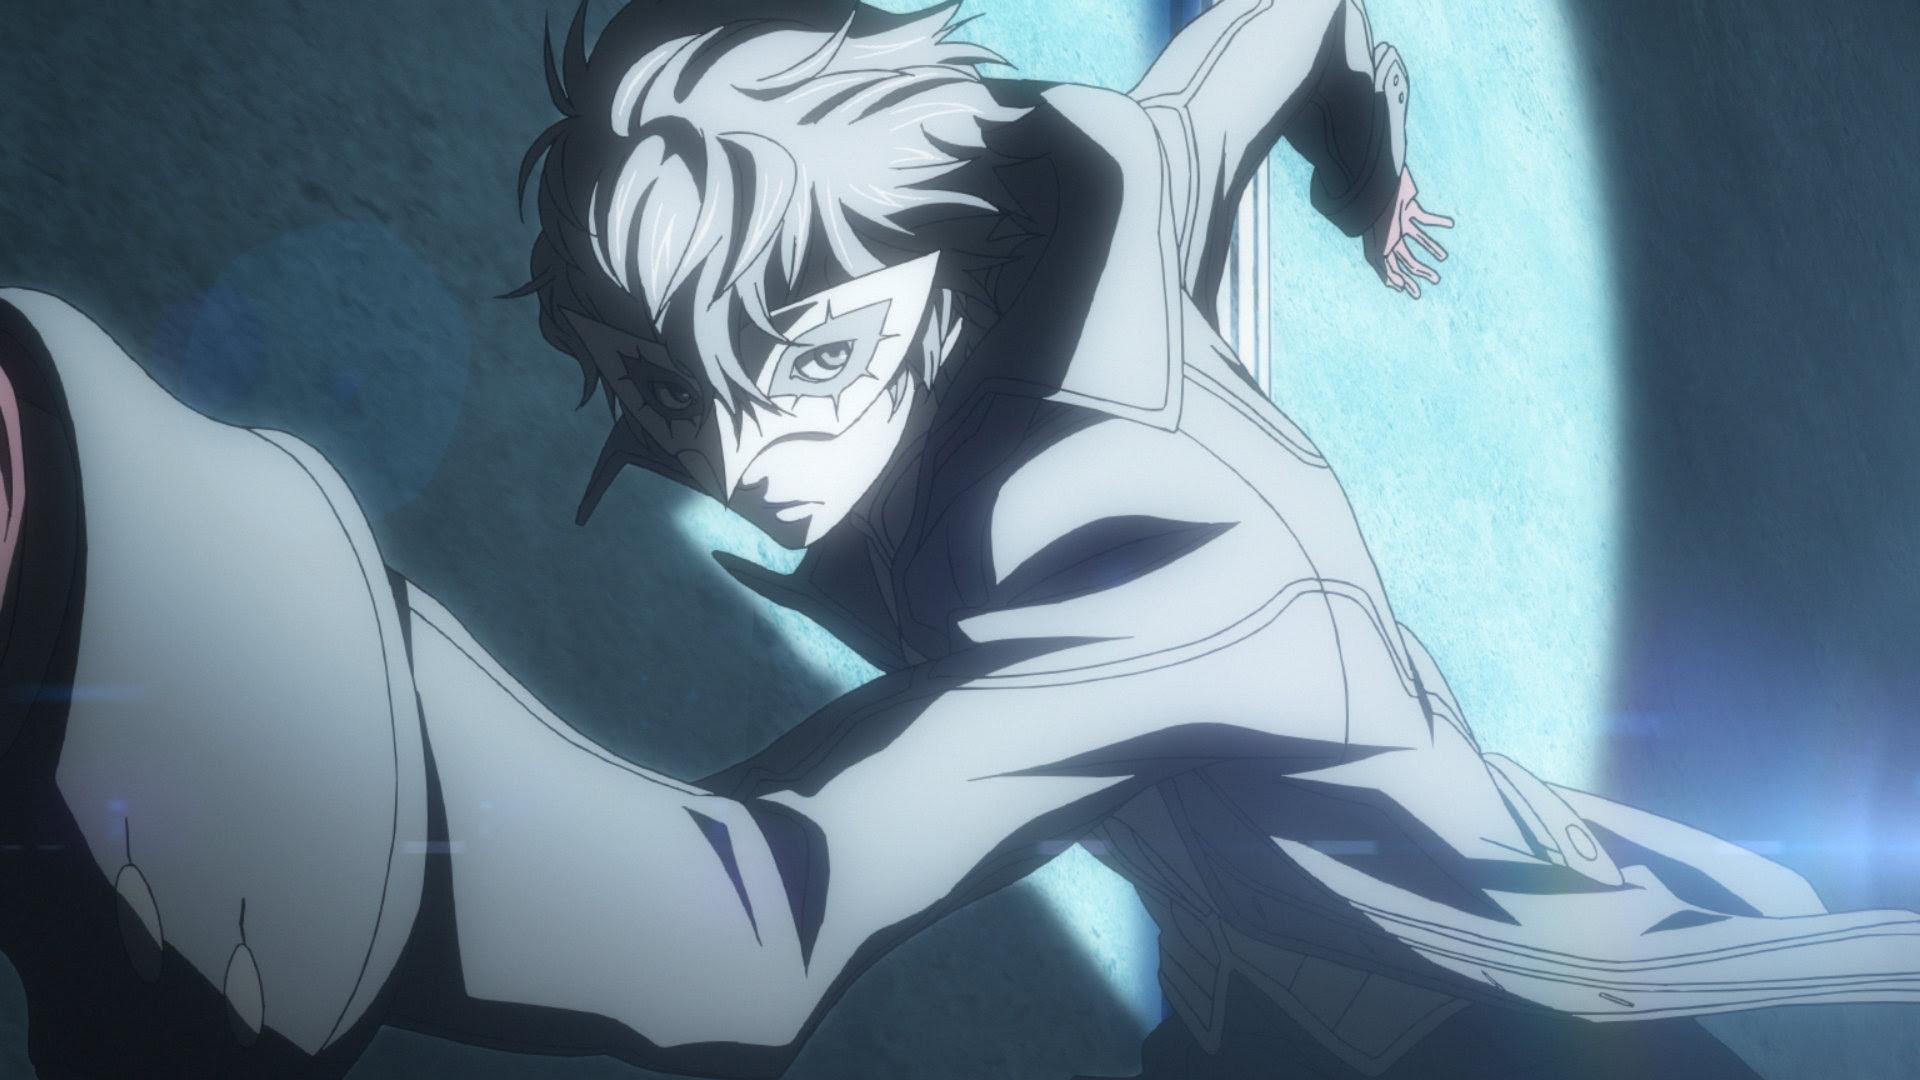 Atlus has a slight change of heart regarding Persona 5 streaming screenshot